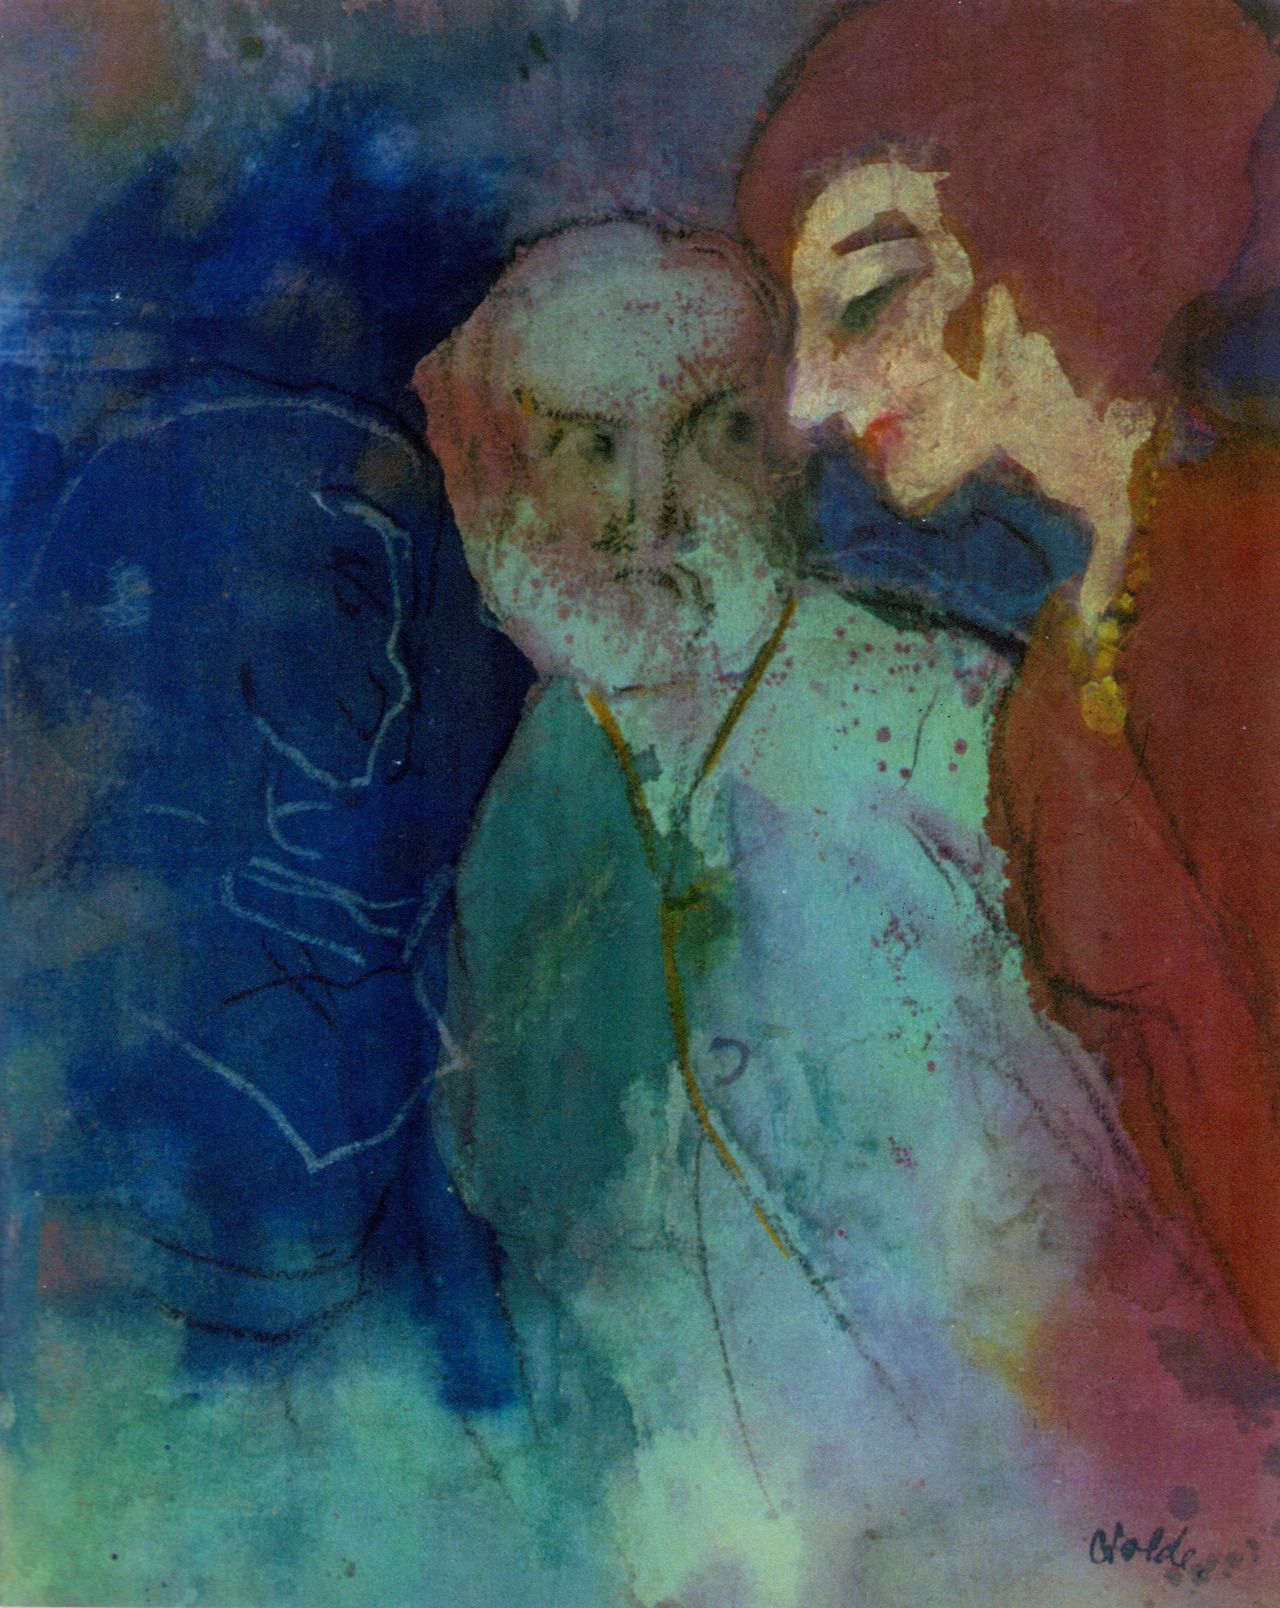 Alter Mann Und Junge Frau C 1943 Emile Nolde Emil Nolde Artist Painting